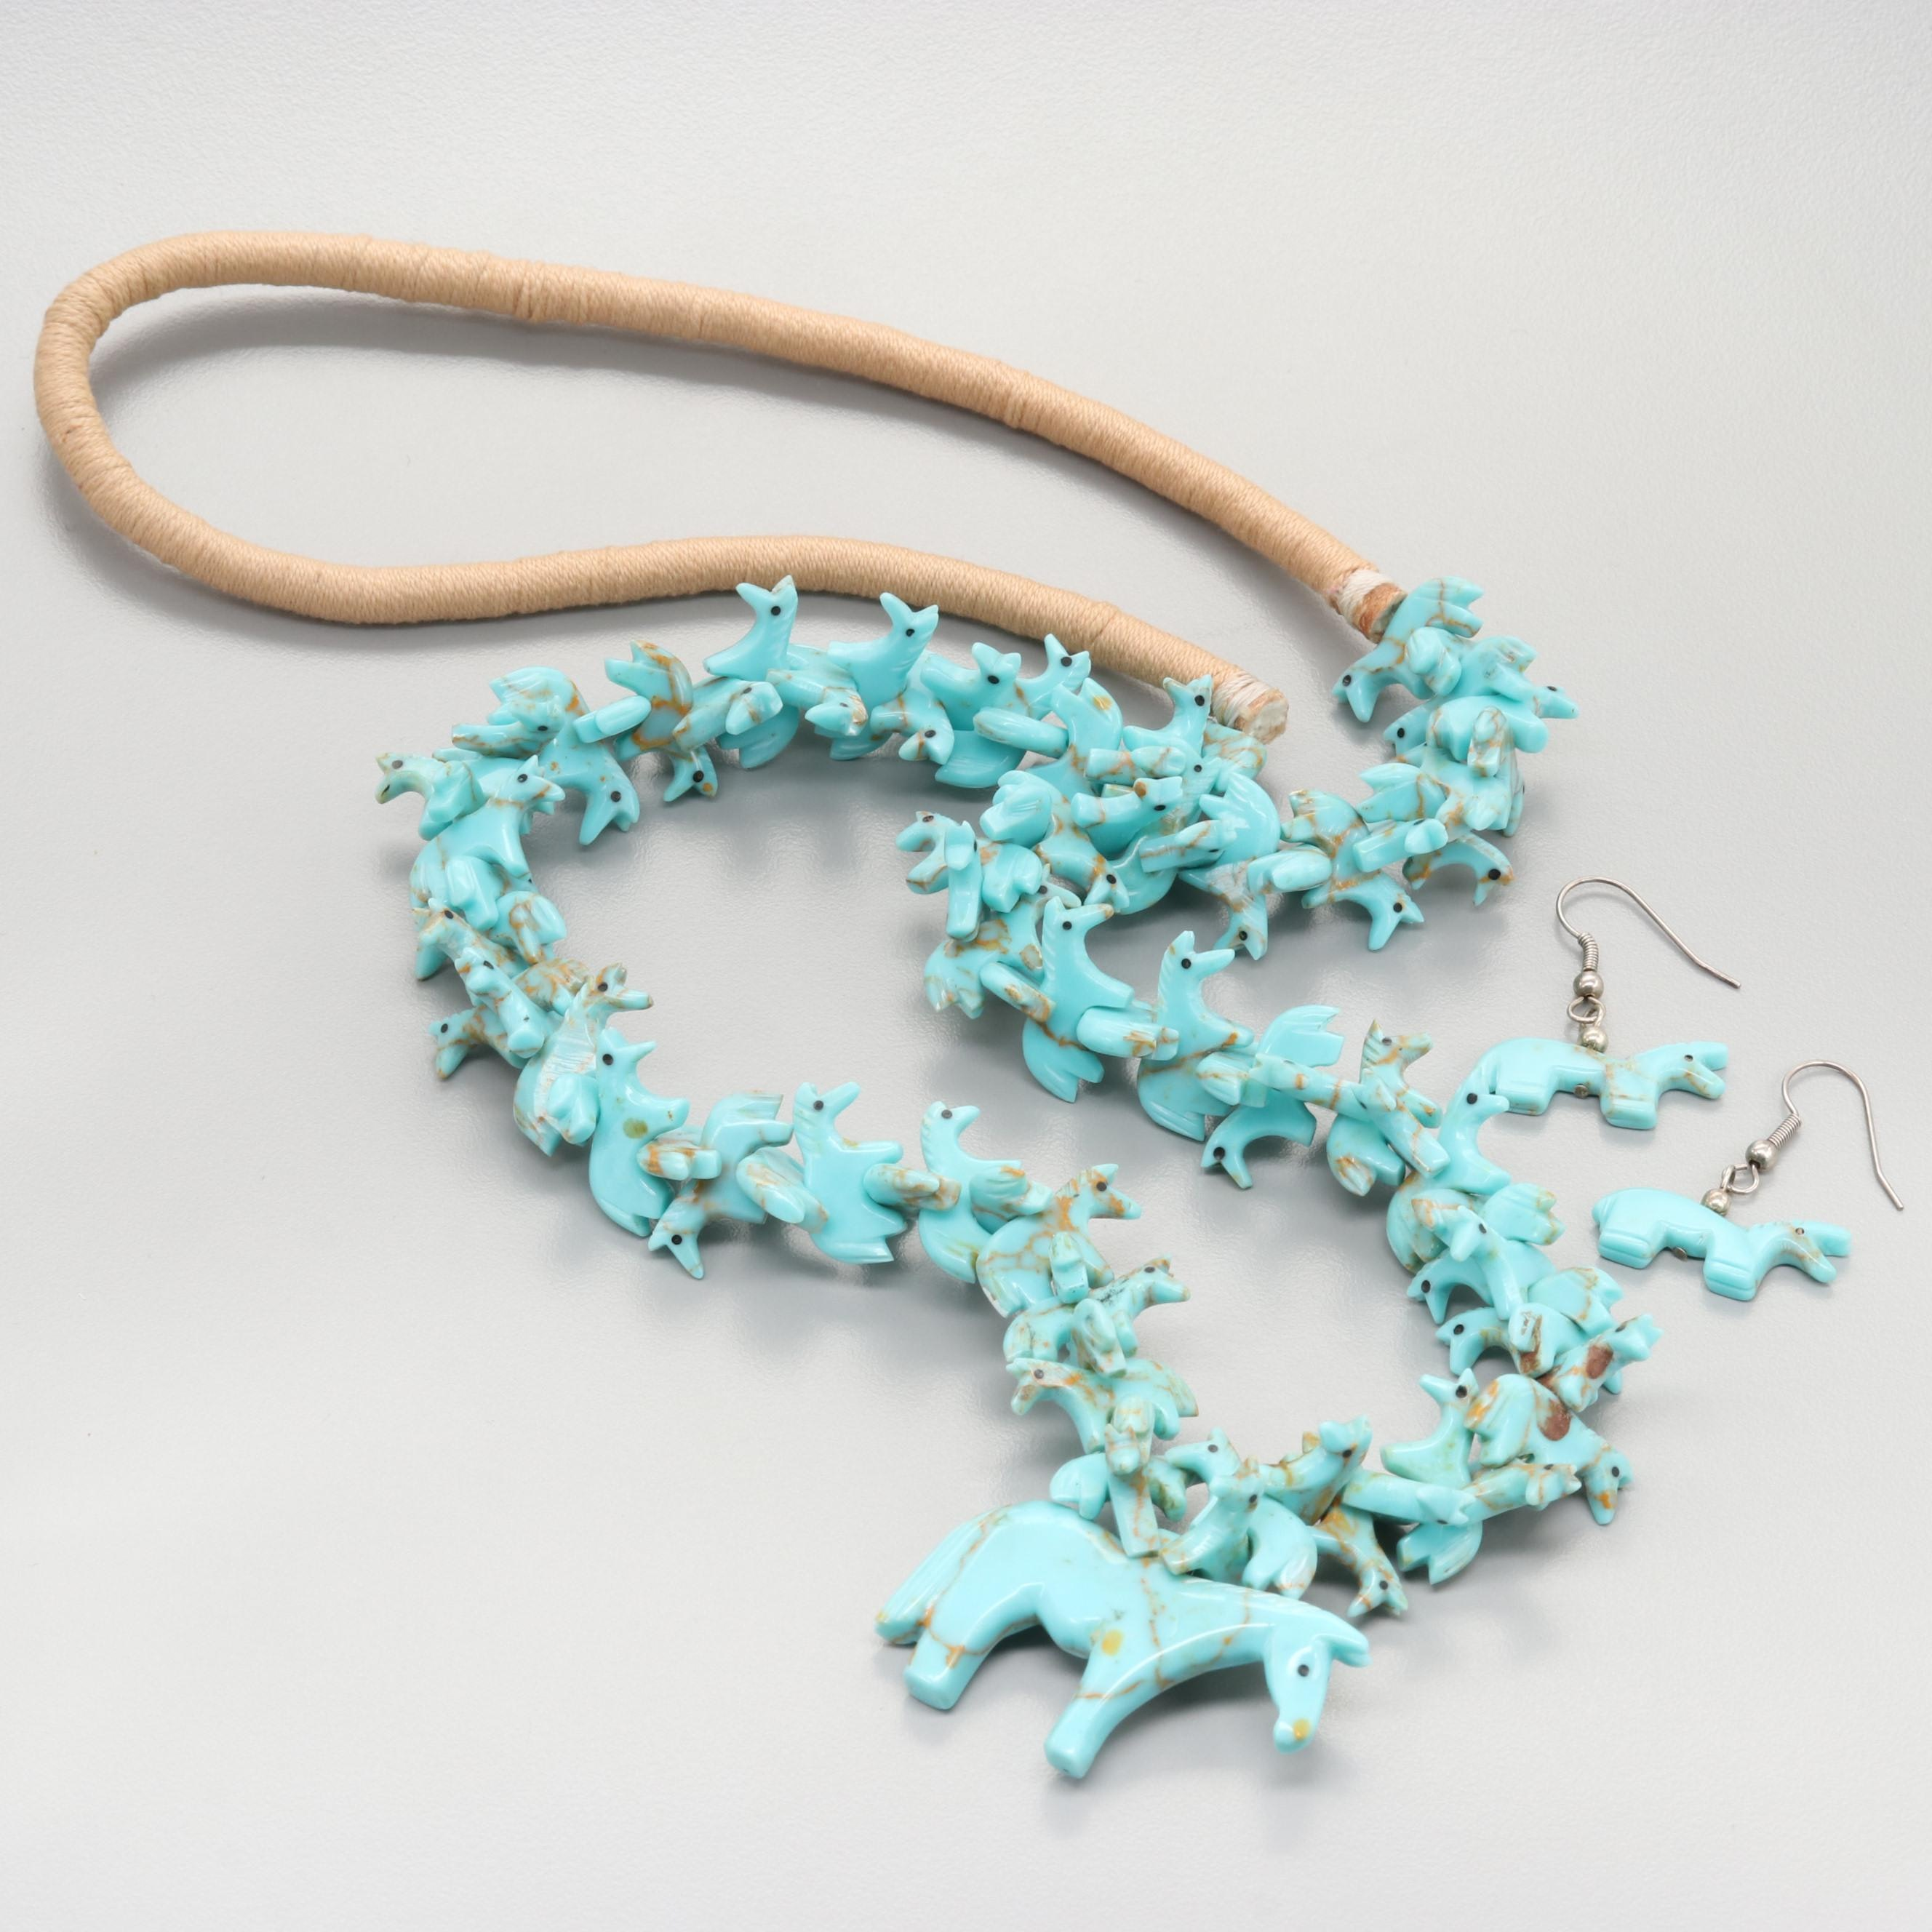 Southwestern Style Turquoise Horse Fetish Necklace and Earrings